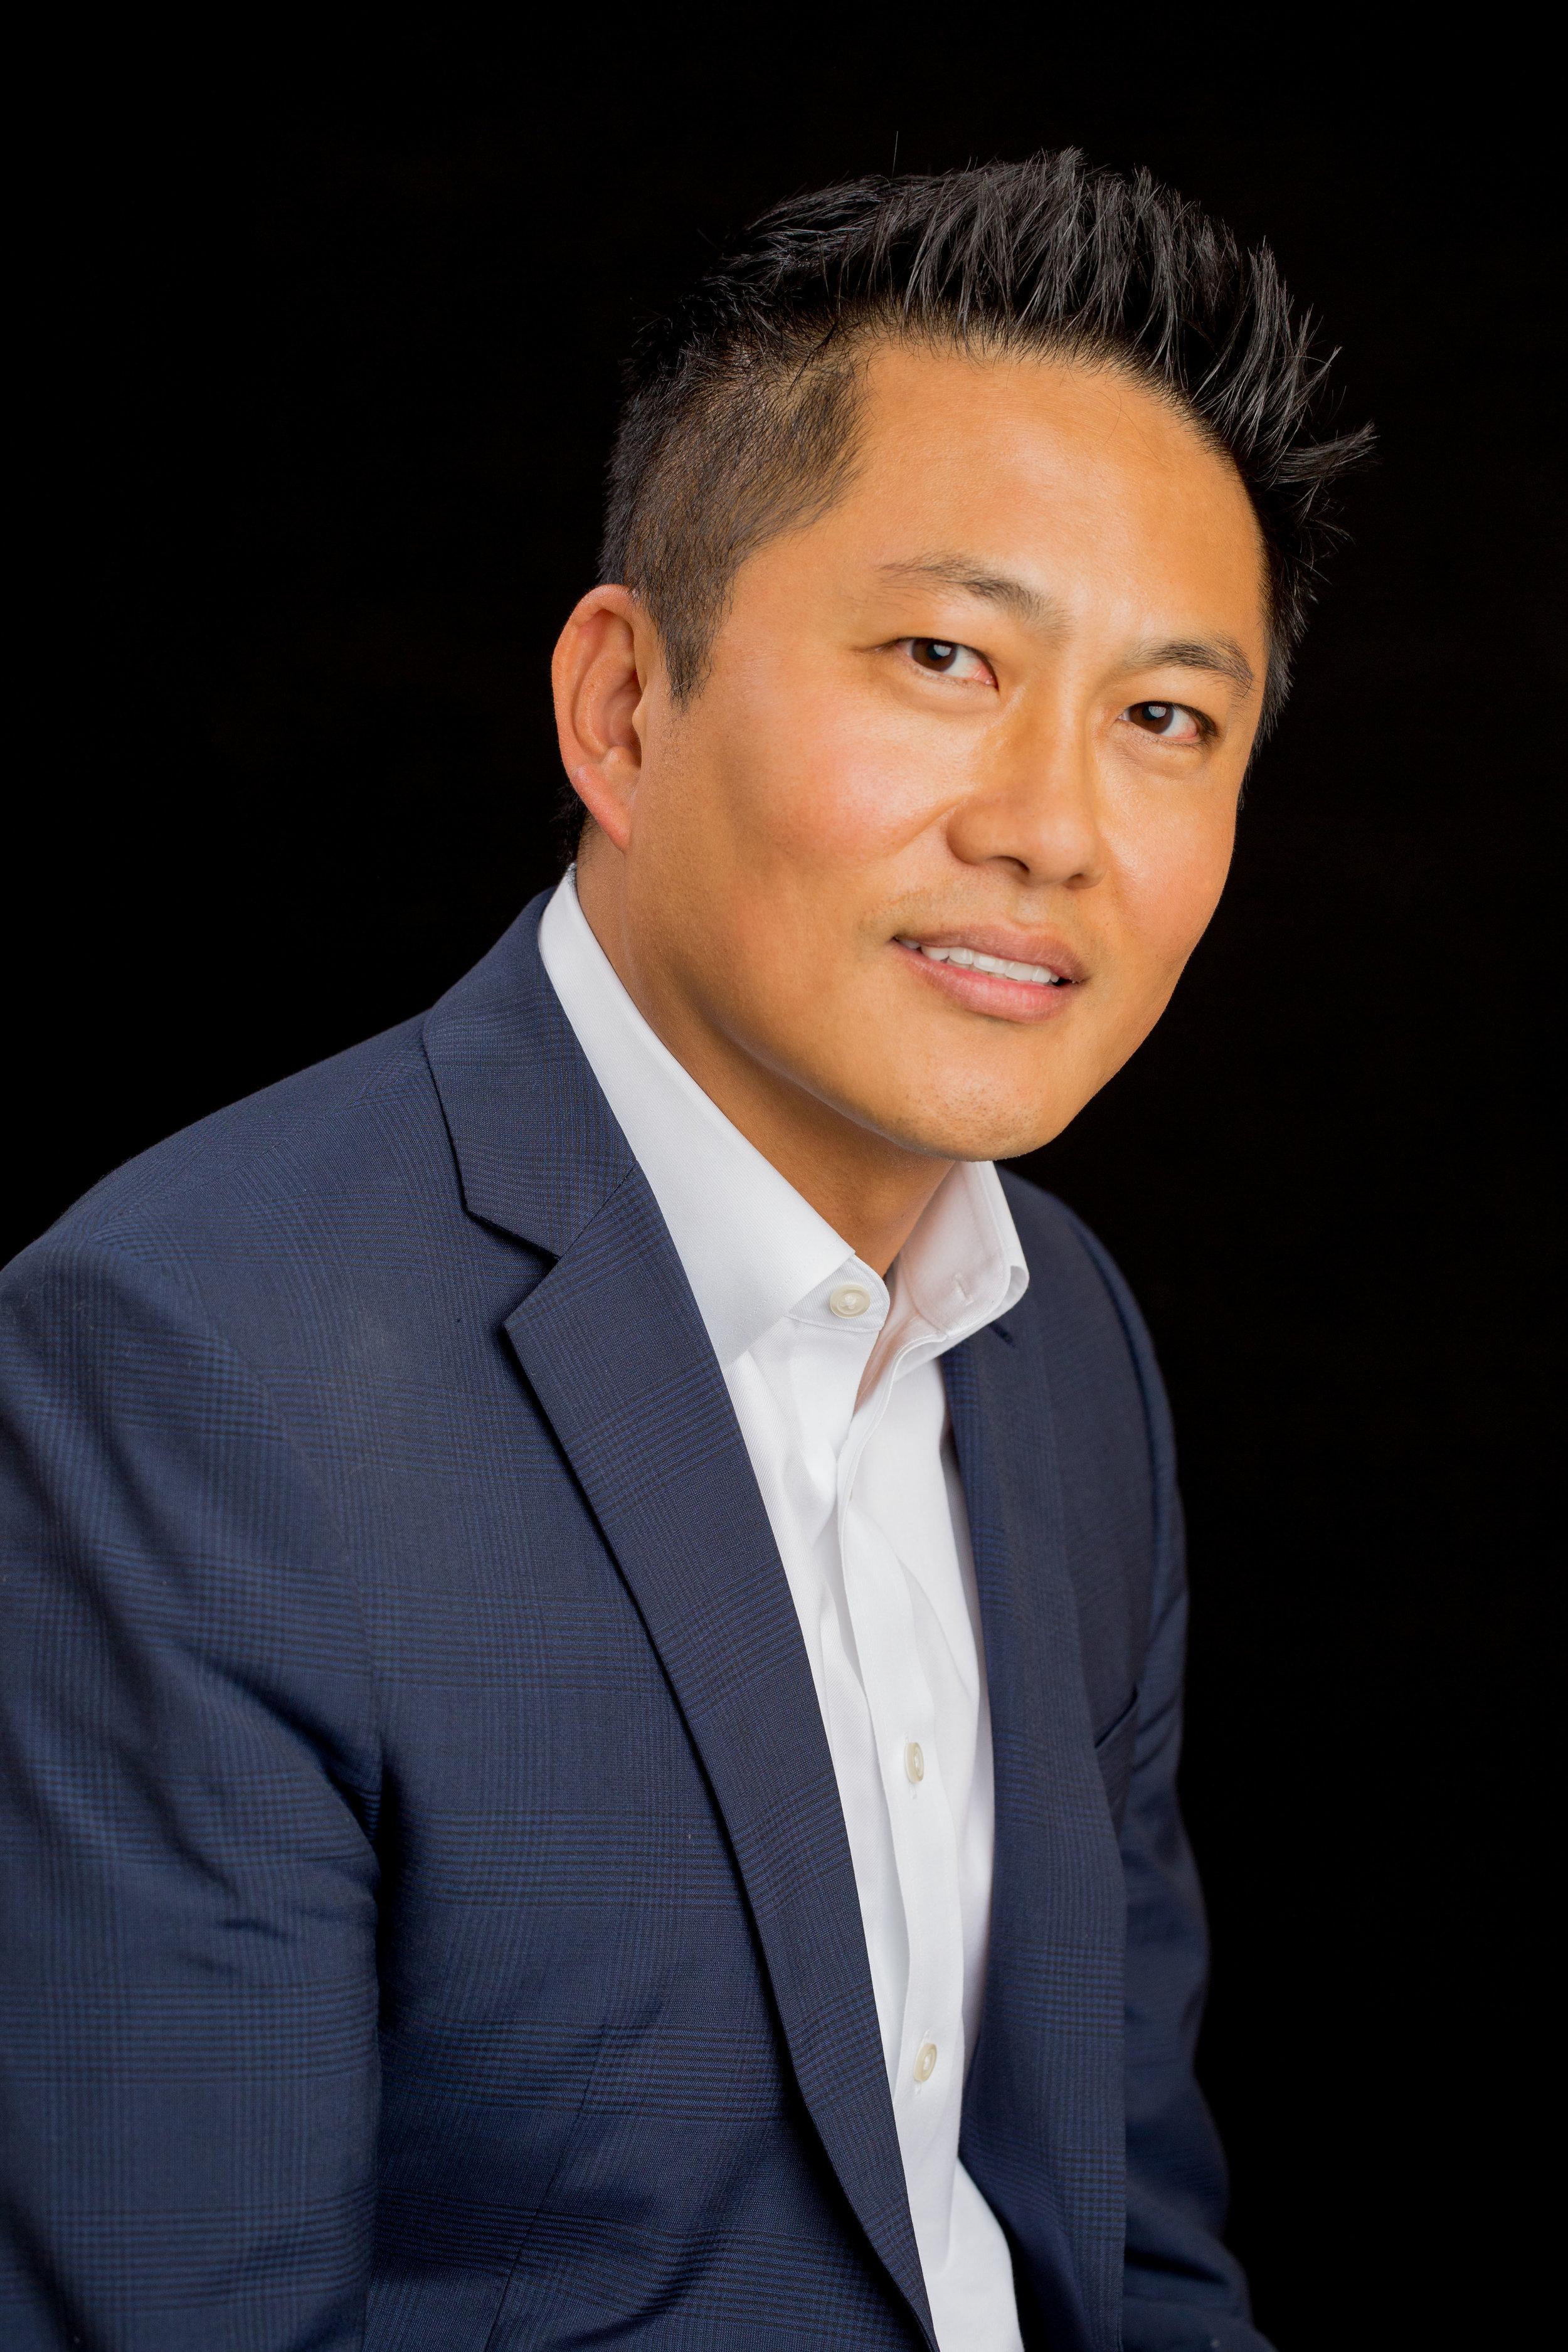 Philip Chong - President & CEO